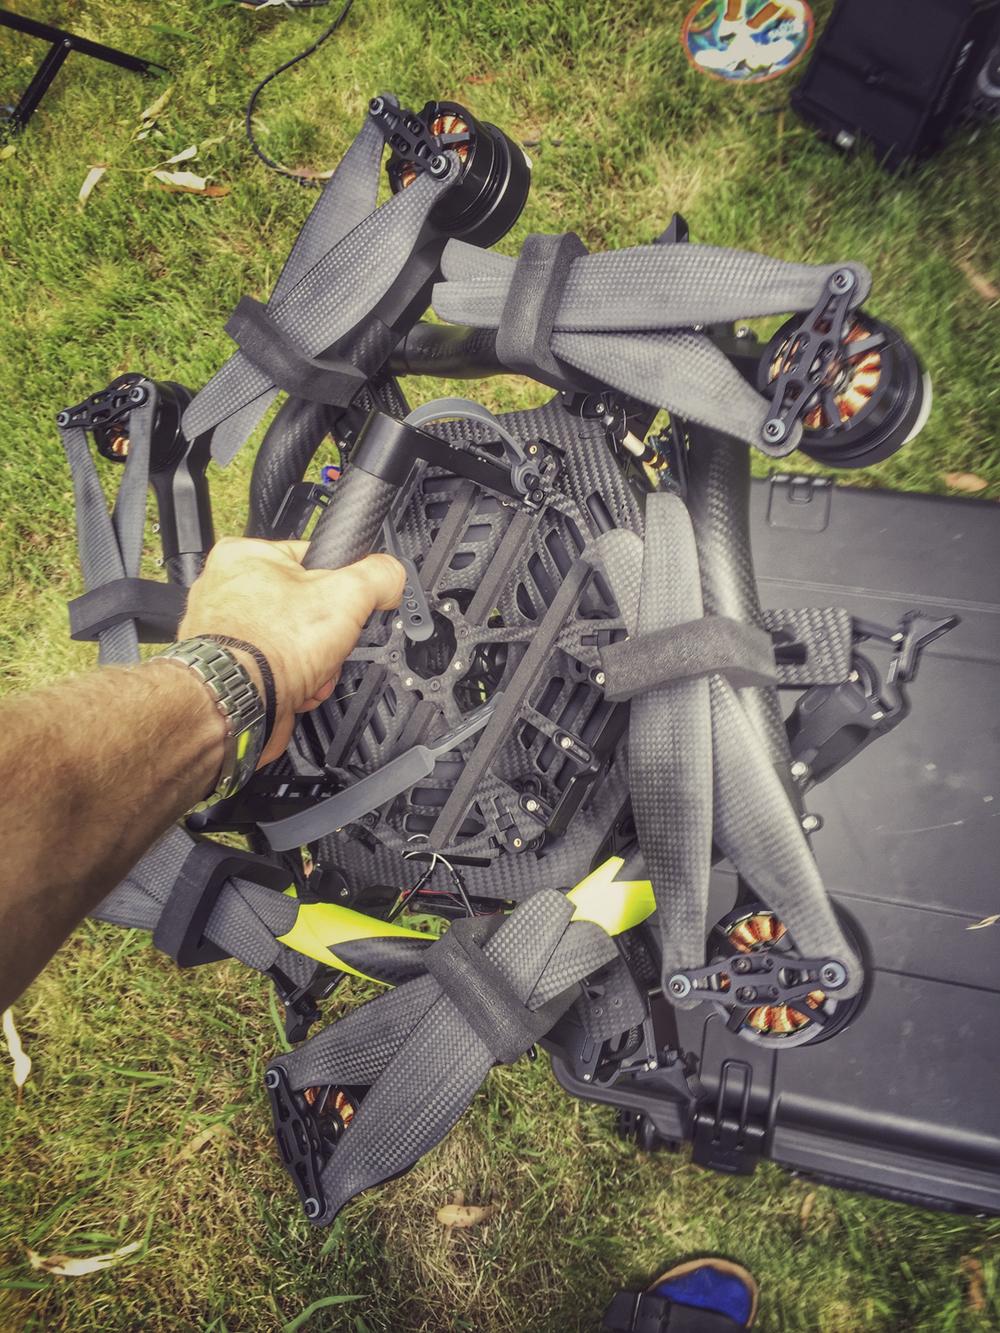 drones-6.jpg